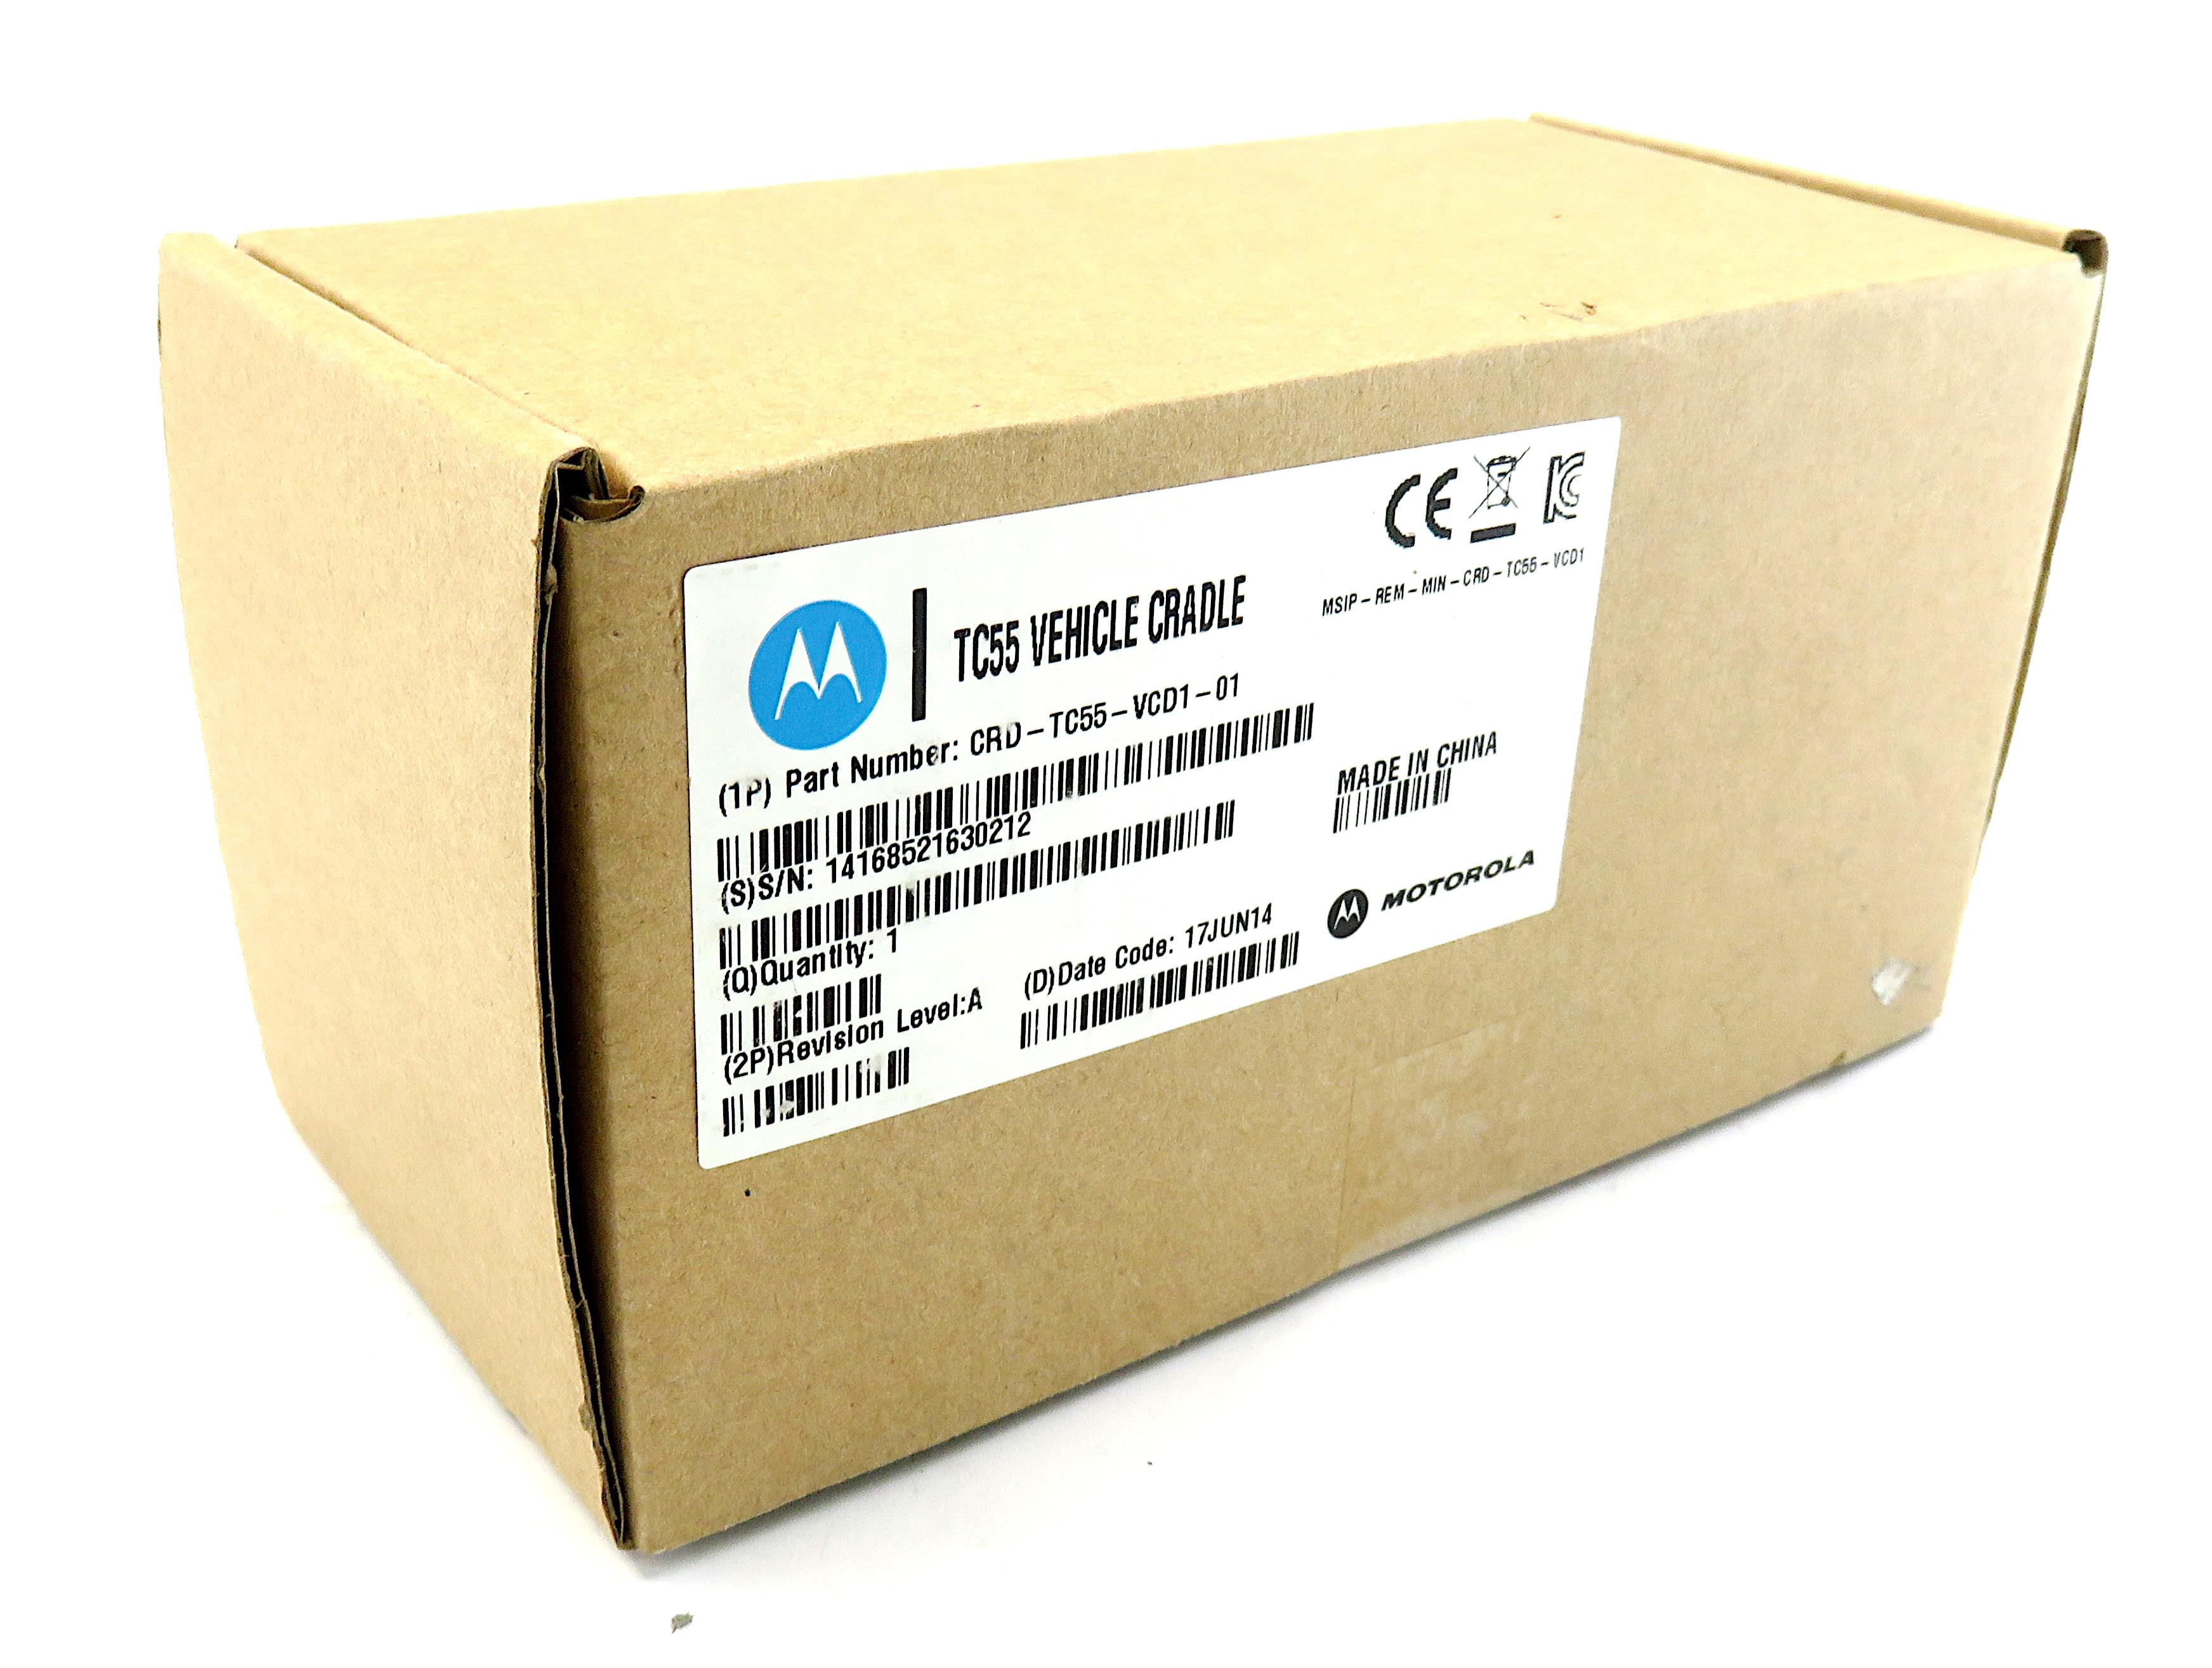 Motorola TC55 Zebra Andrioid PDA Vehicle Cradle - CRD-TC55-VCD1-01